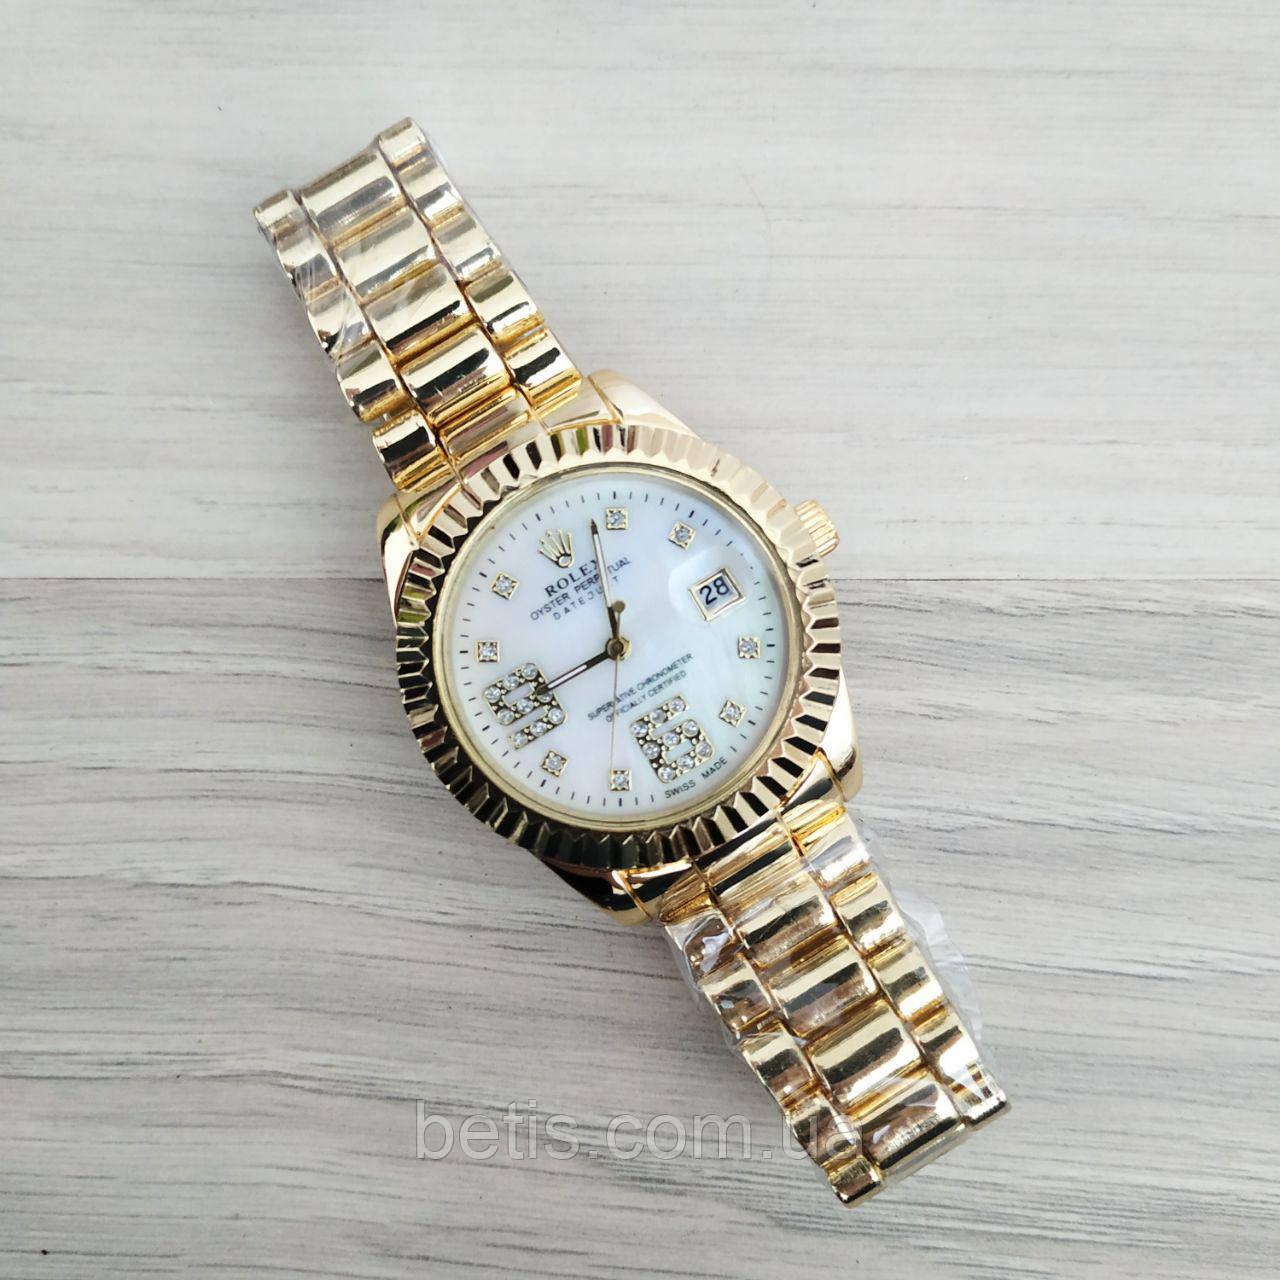 Rolex SKPAN-1020-0778